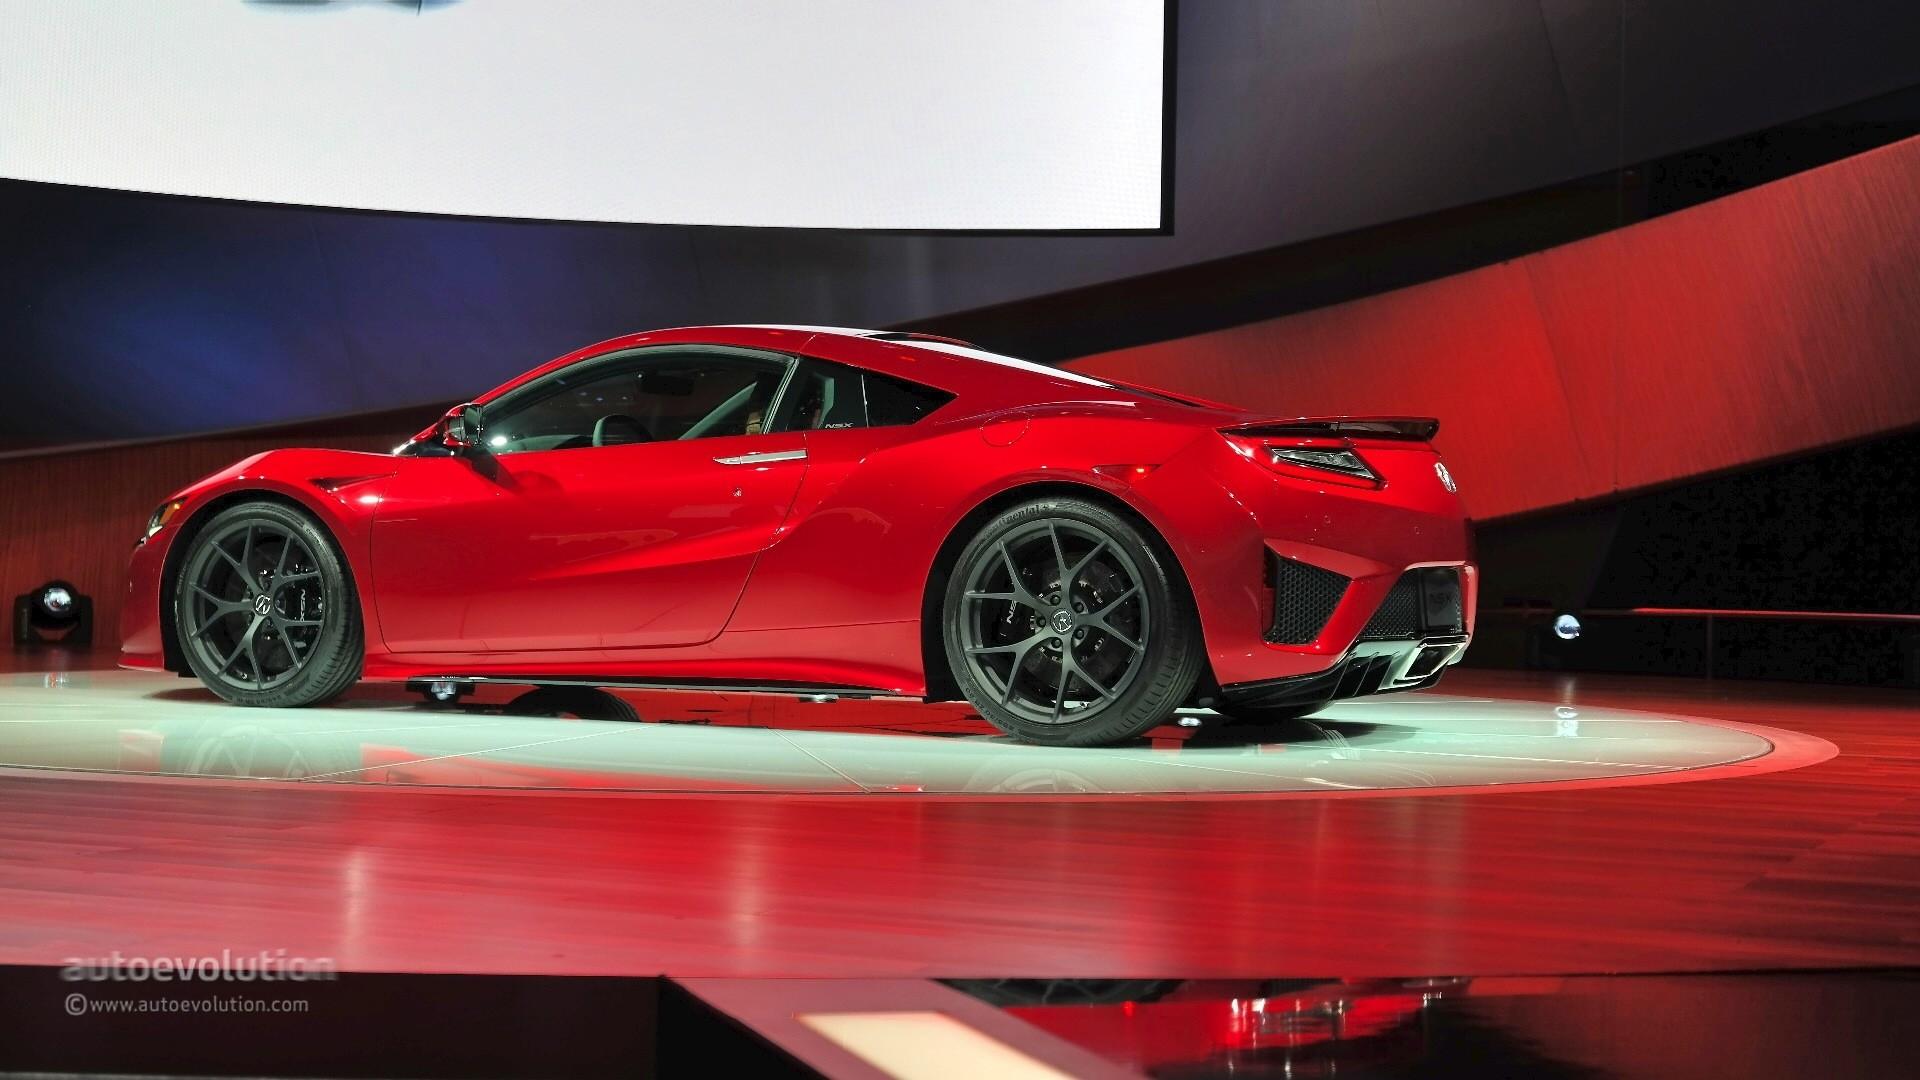 2016 Acura Nsx 2017 Detroit Auto Show